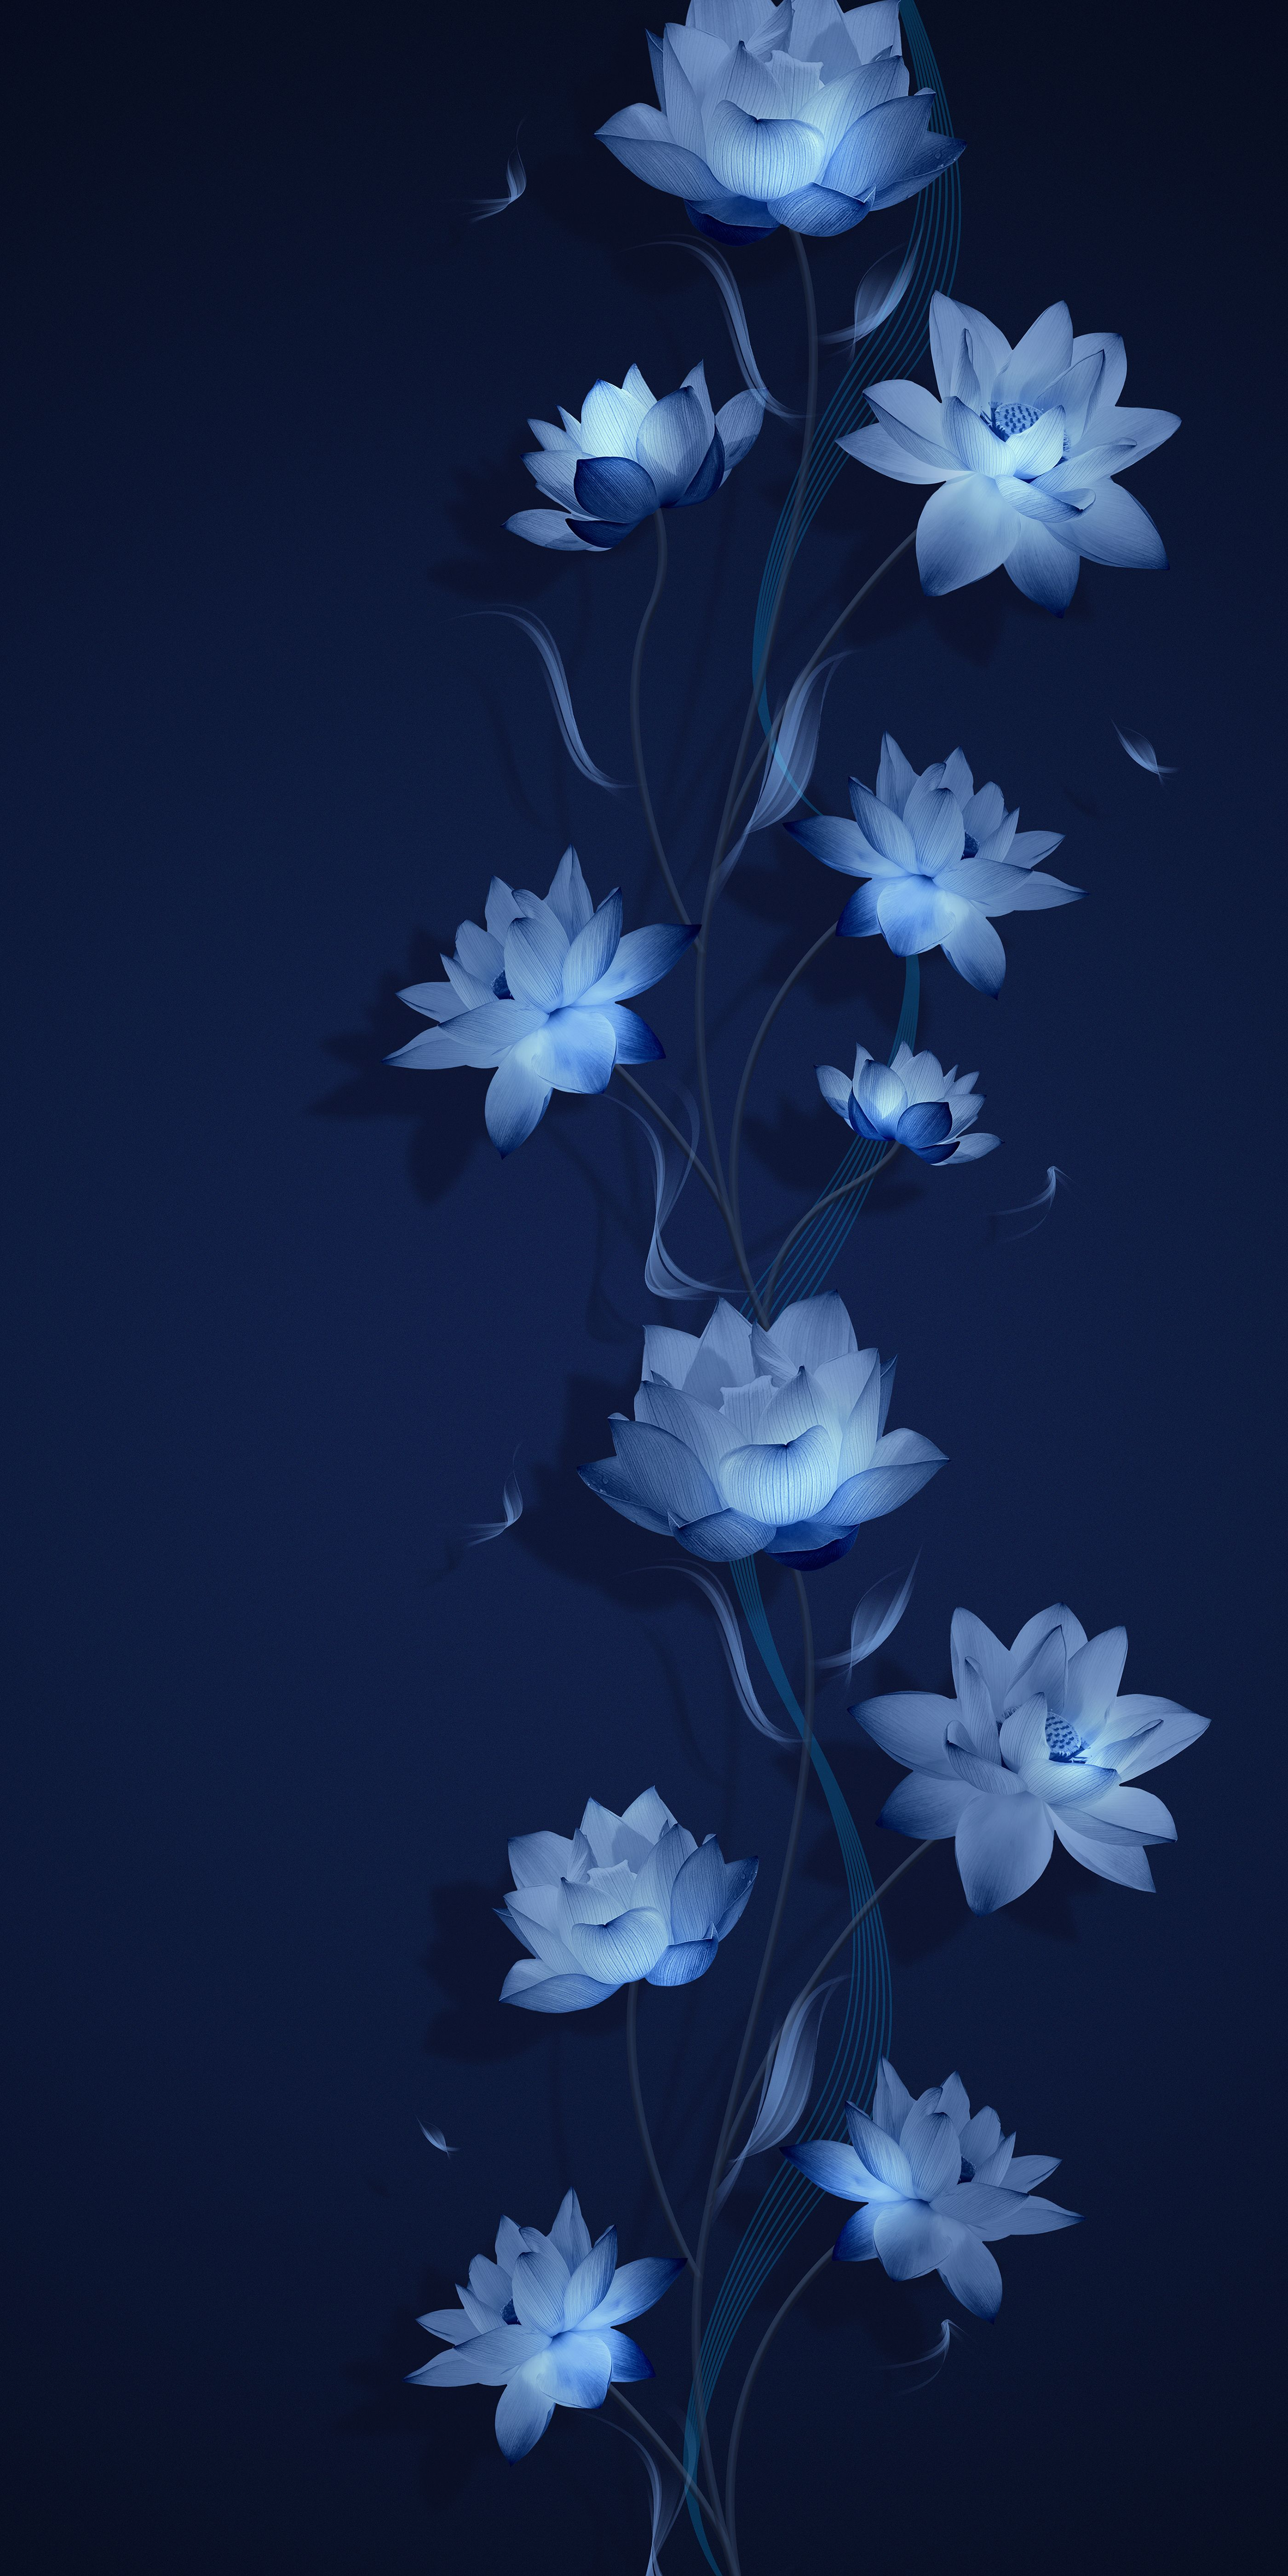 Lg Hausys On Behance Flower Background Wallpaper Flower Iphone Wallpaper Blue Flower Wallpaper